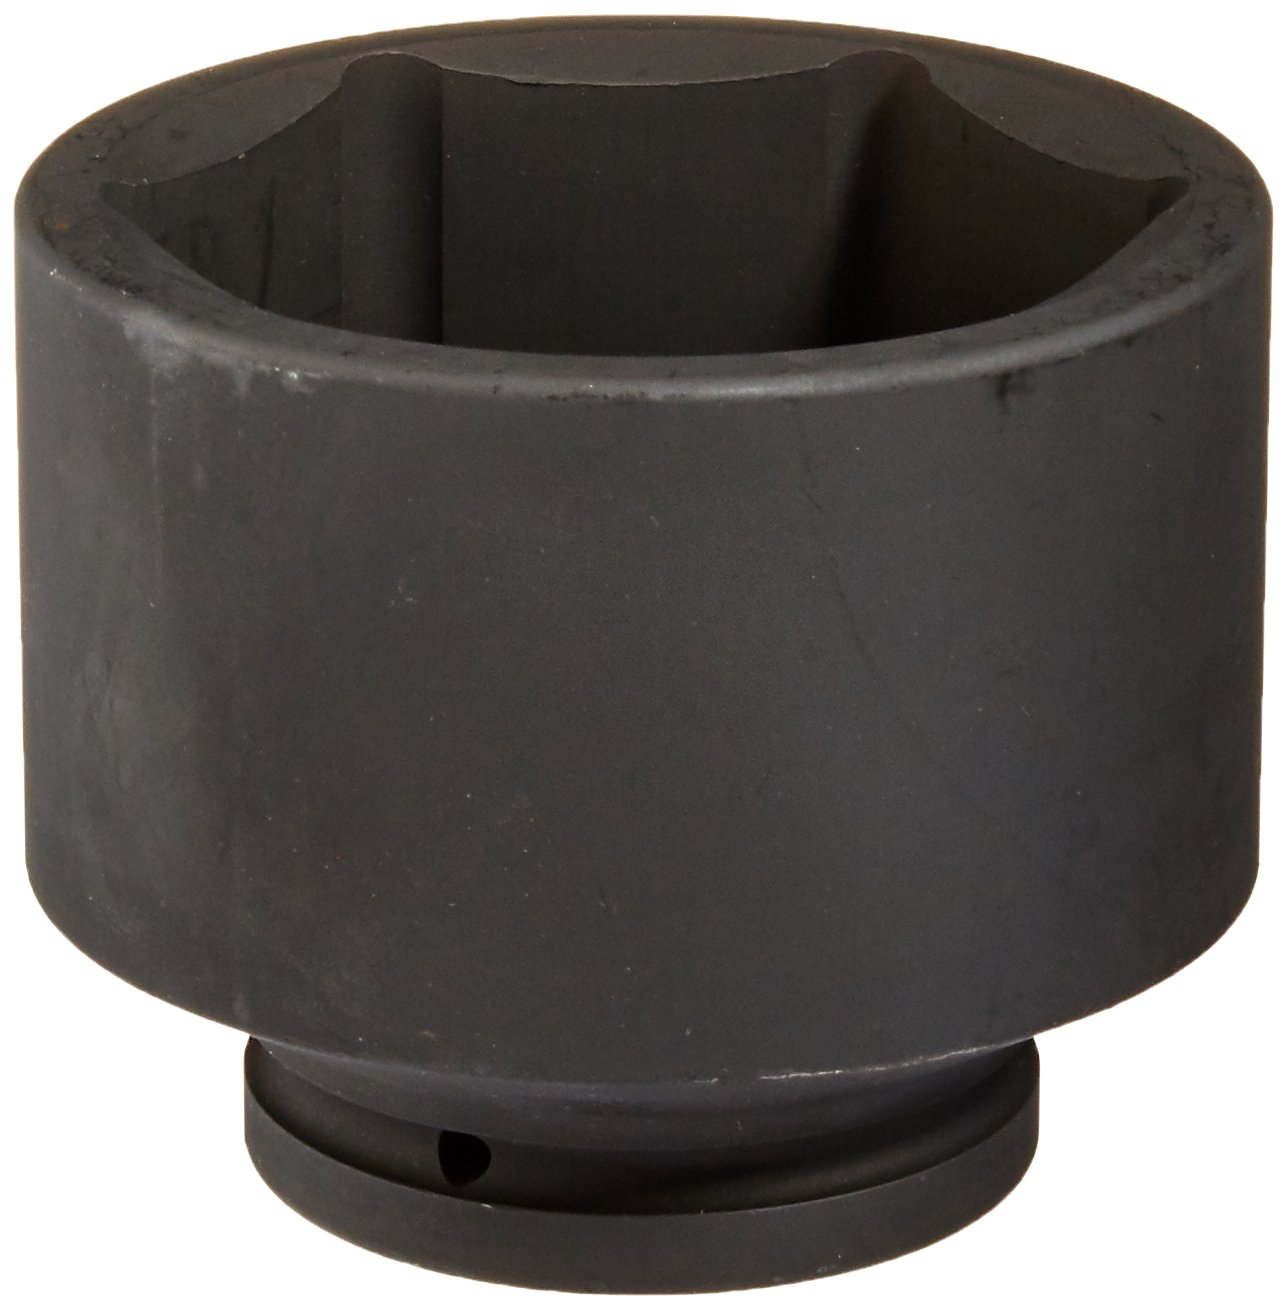 Sunex 5136 1-Inch Drive 4-1/4-Inch Impact Socket